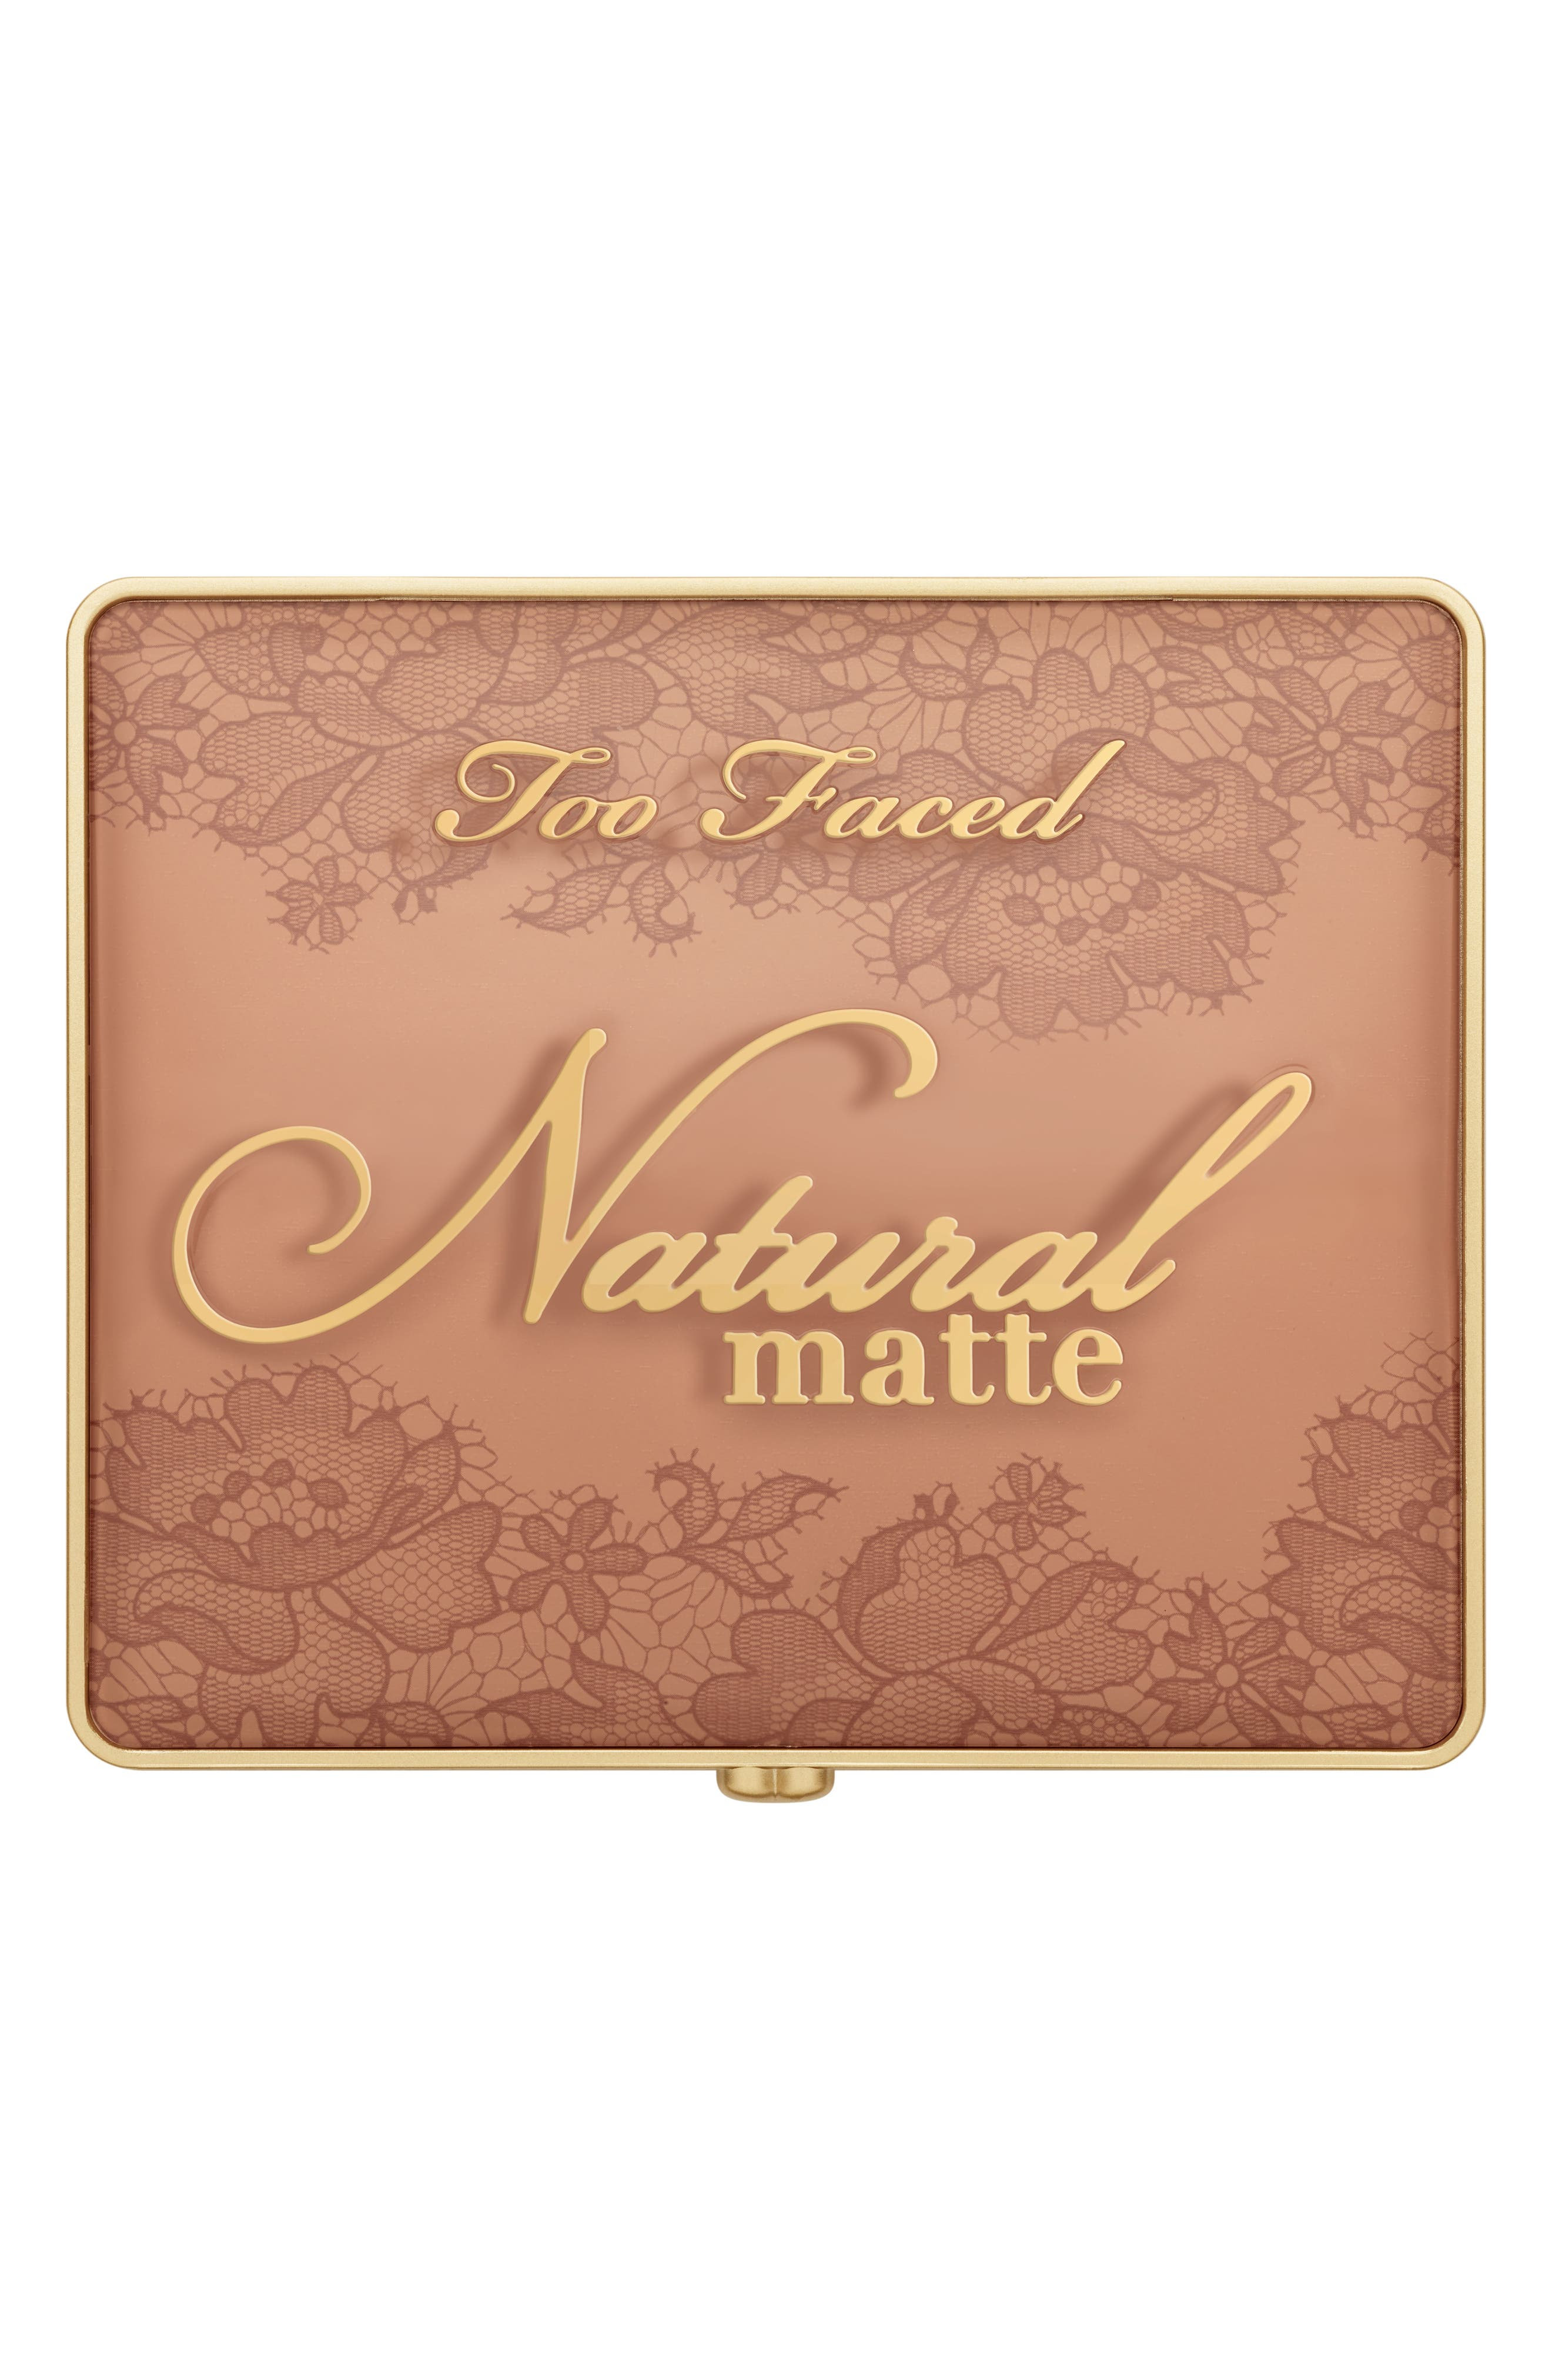 Natural Matte Eyeshadow Palette,                             Alternate thumbnail 6, color,                             NO COLOR